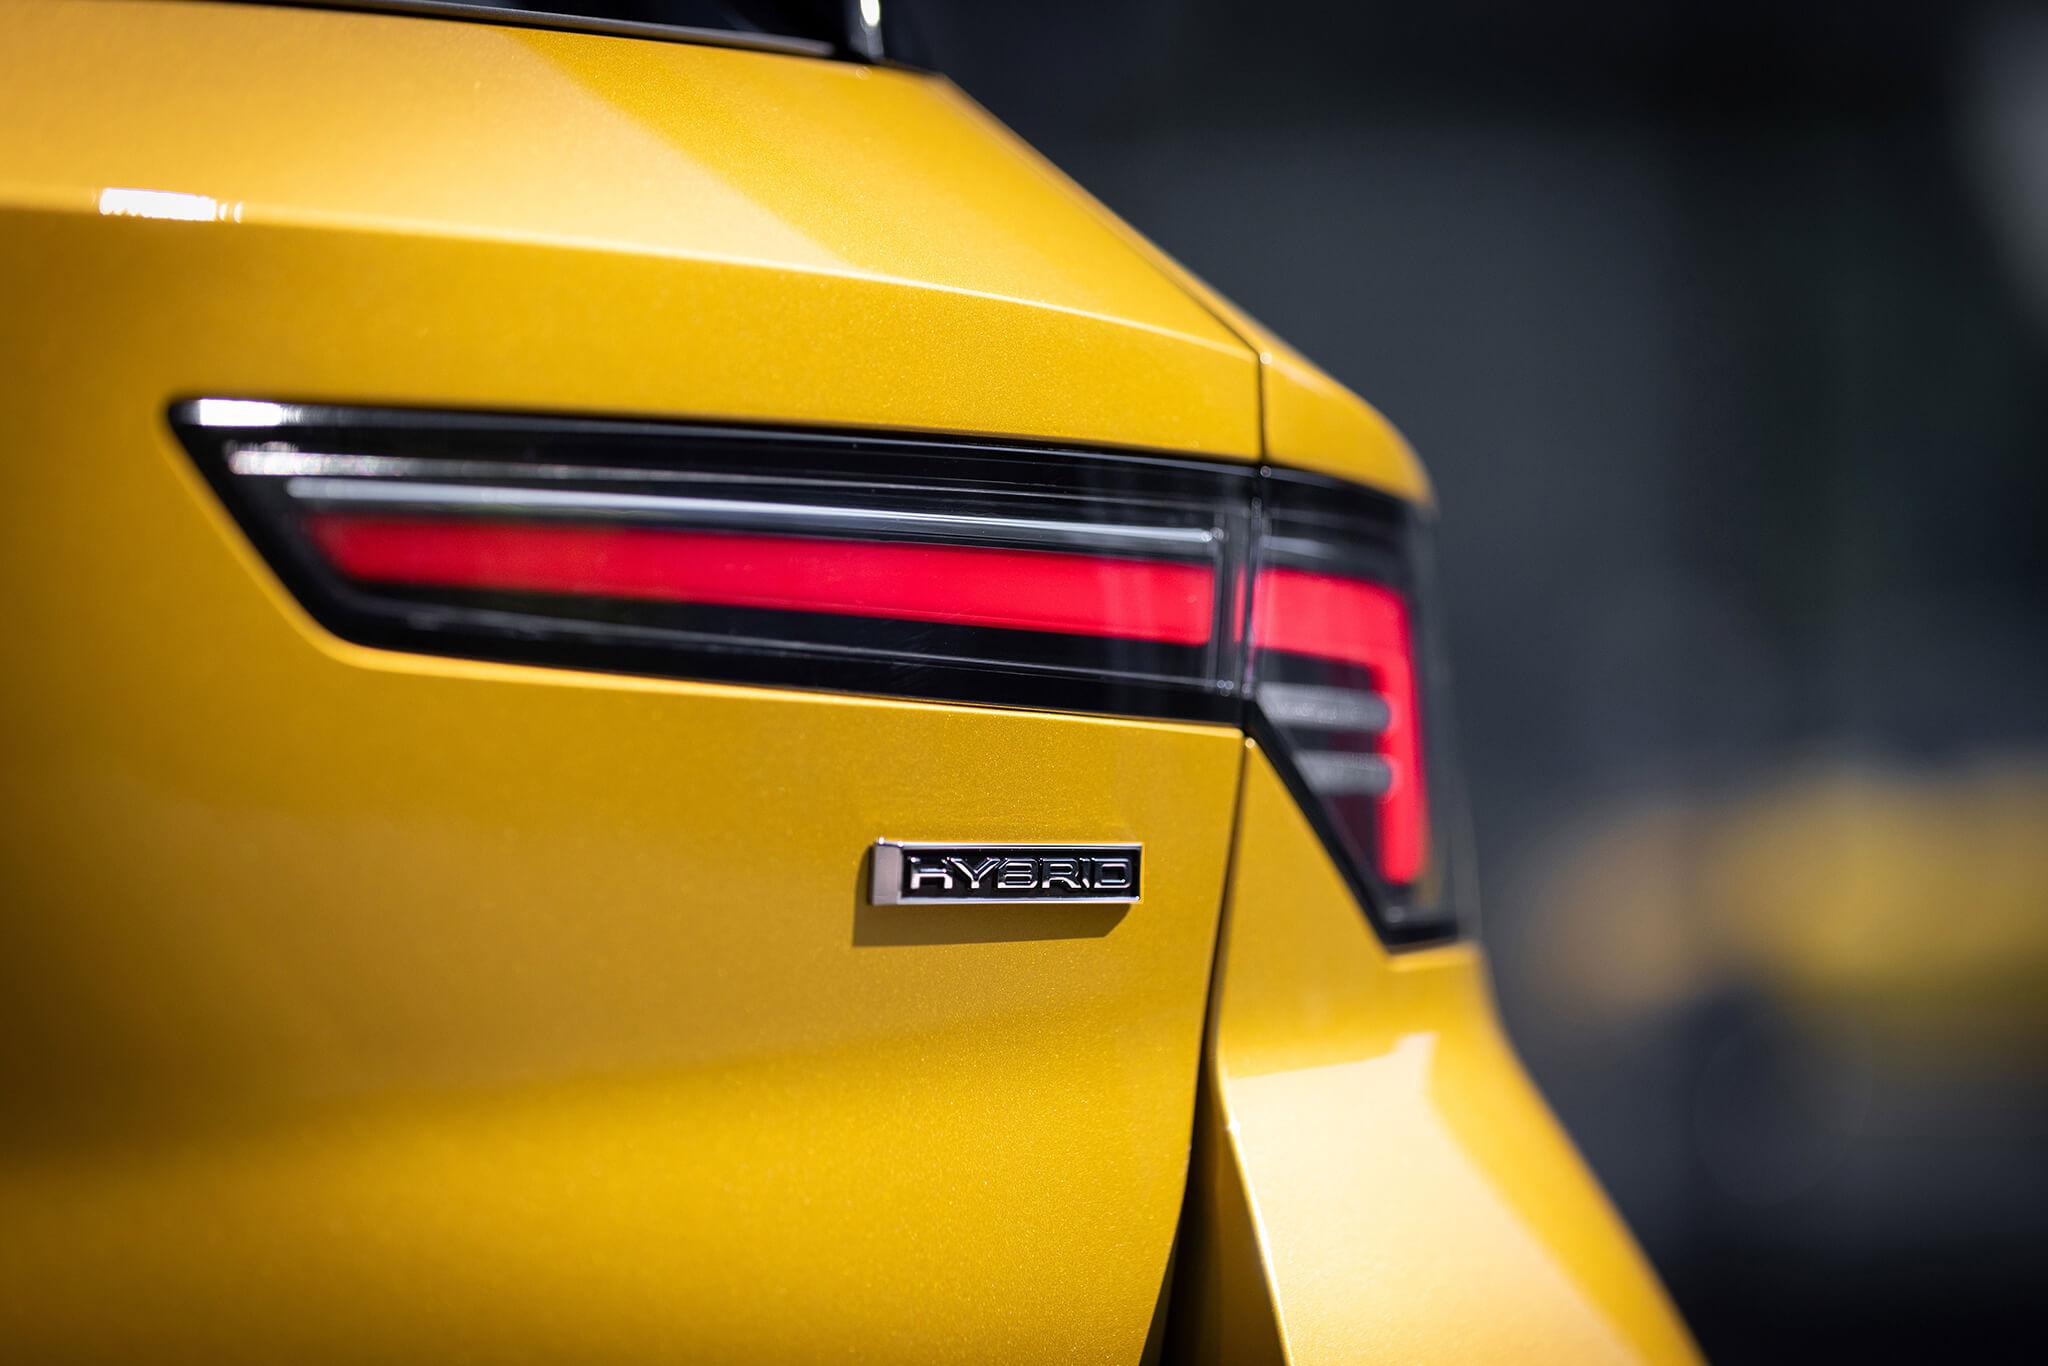 Opel Astra L Hybrid